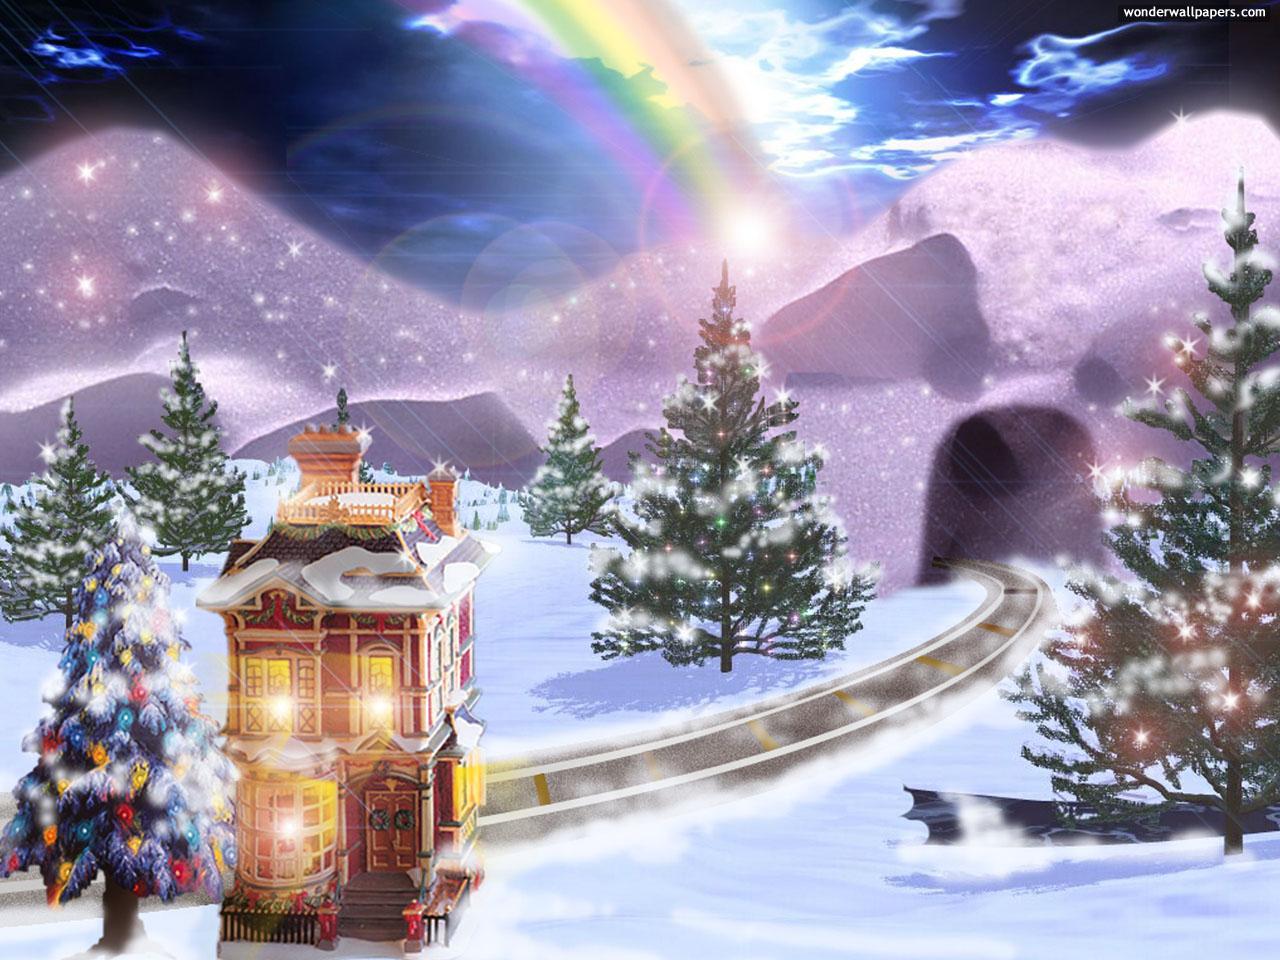 Desktop Christmas wallpaper hd christmas wallpaper nightmare before 1280x960